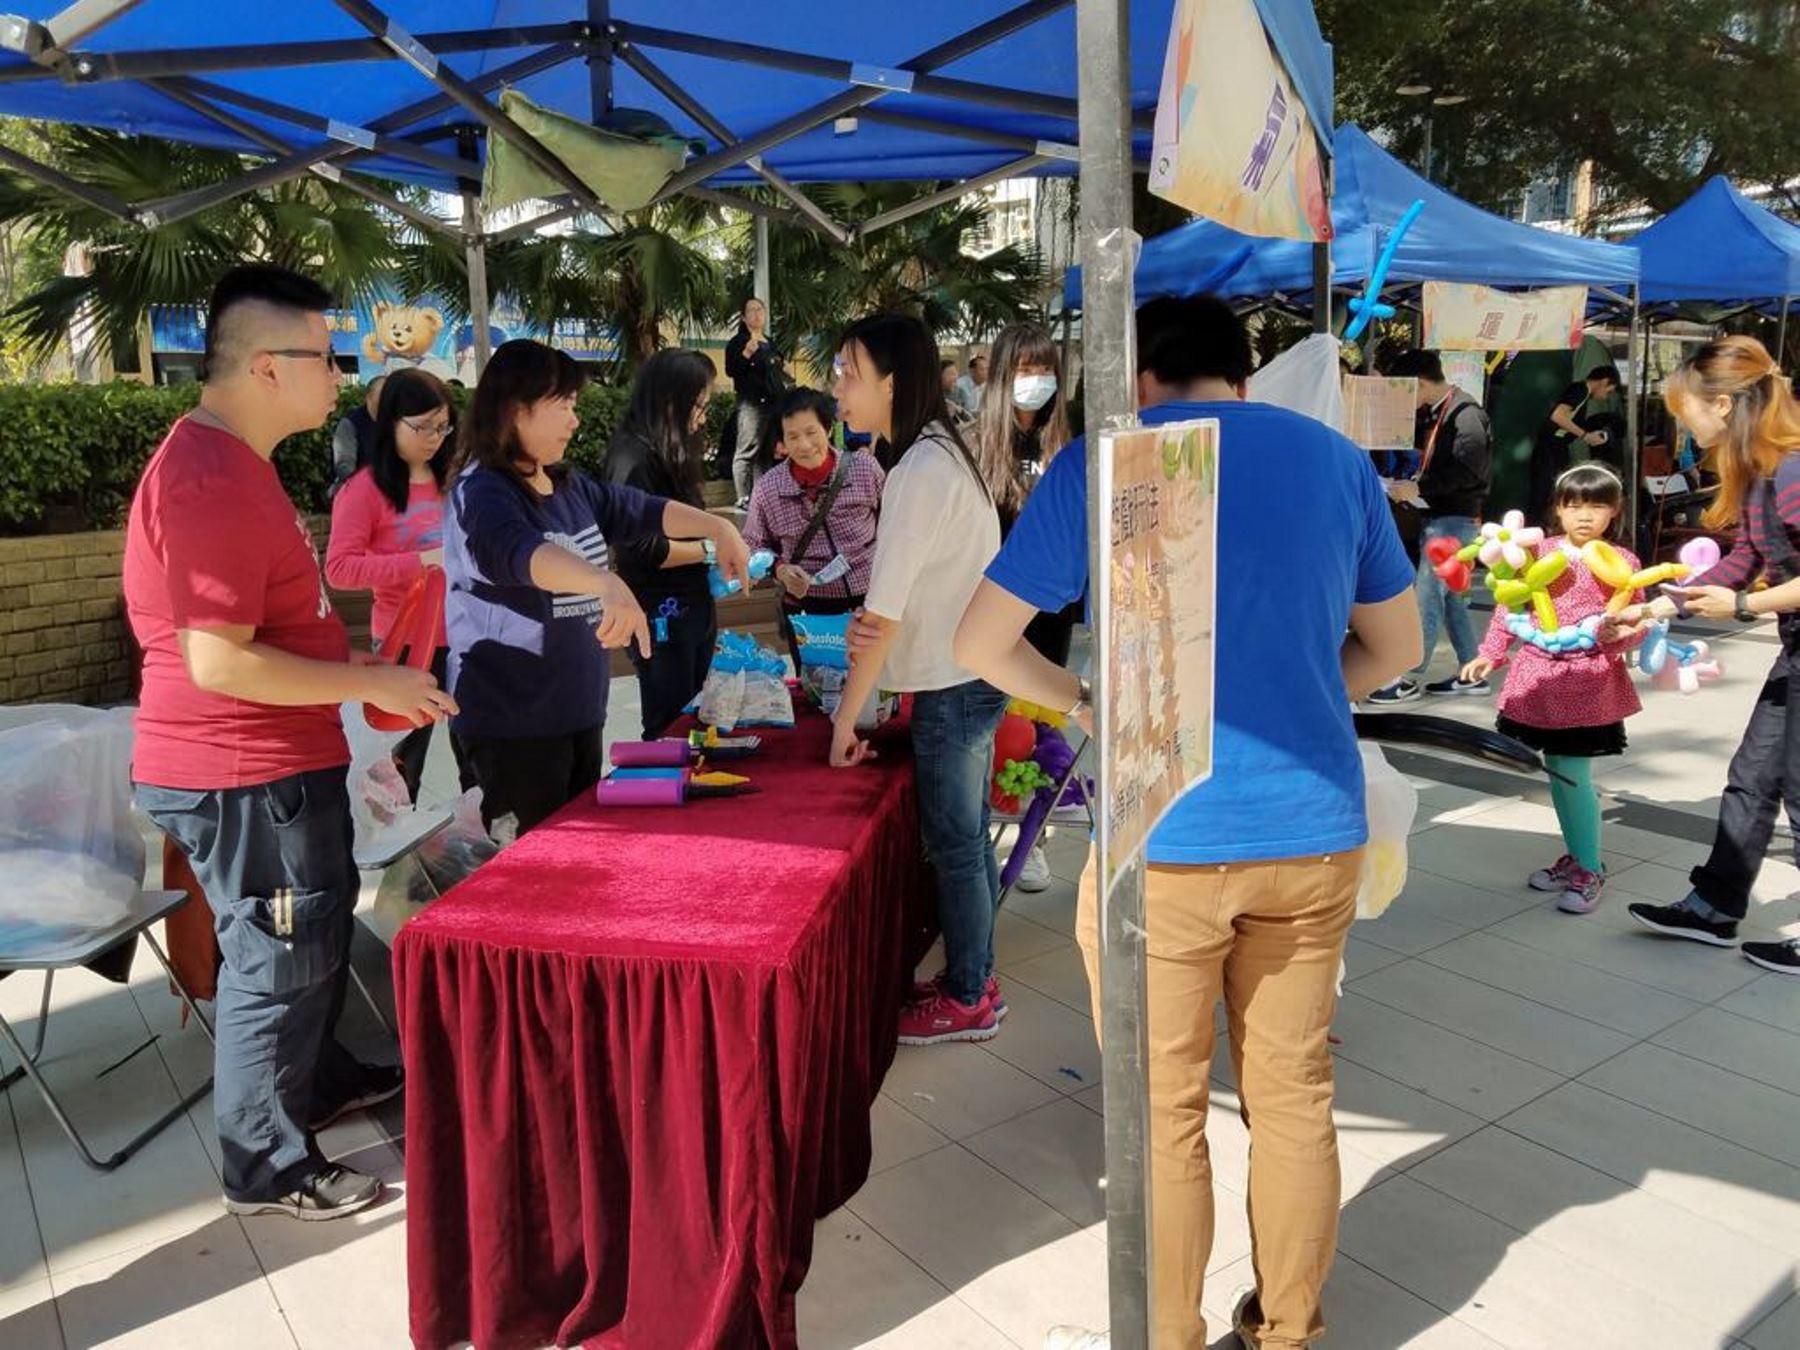 http://npc.edu.hk/sites/default/files/1_1426.jpg